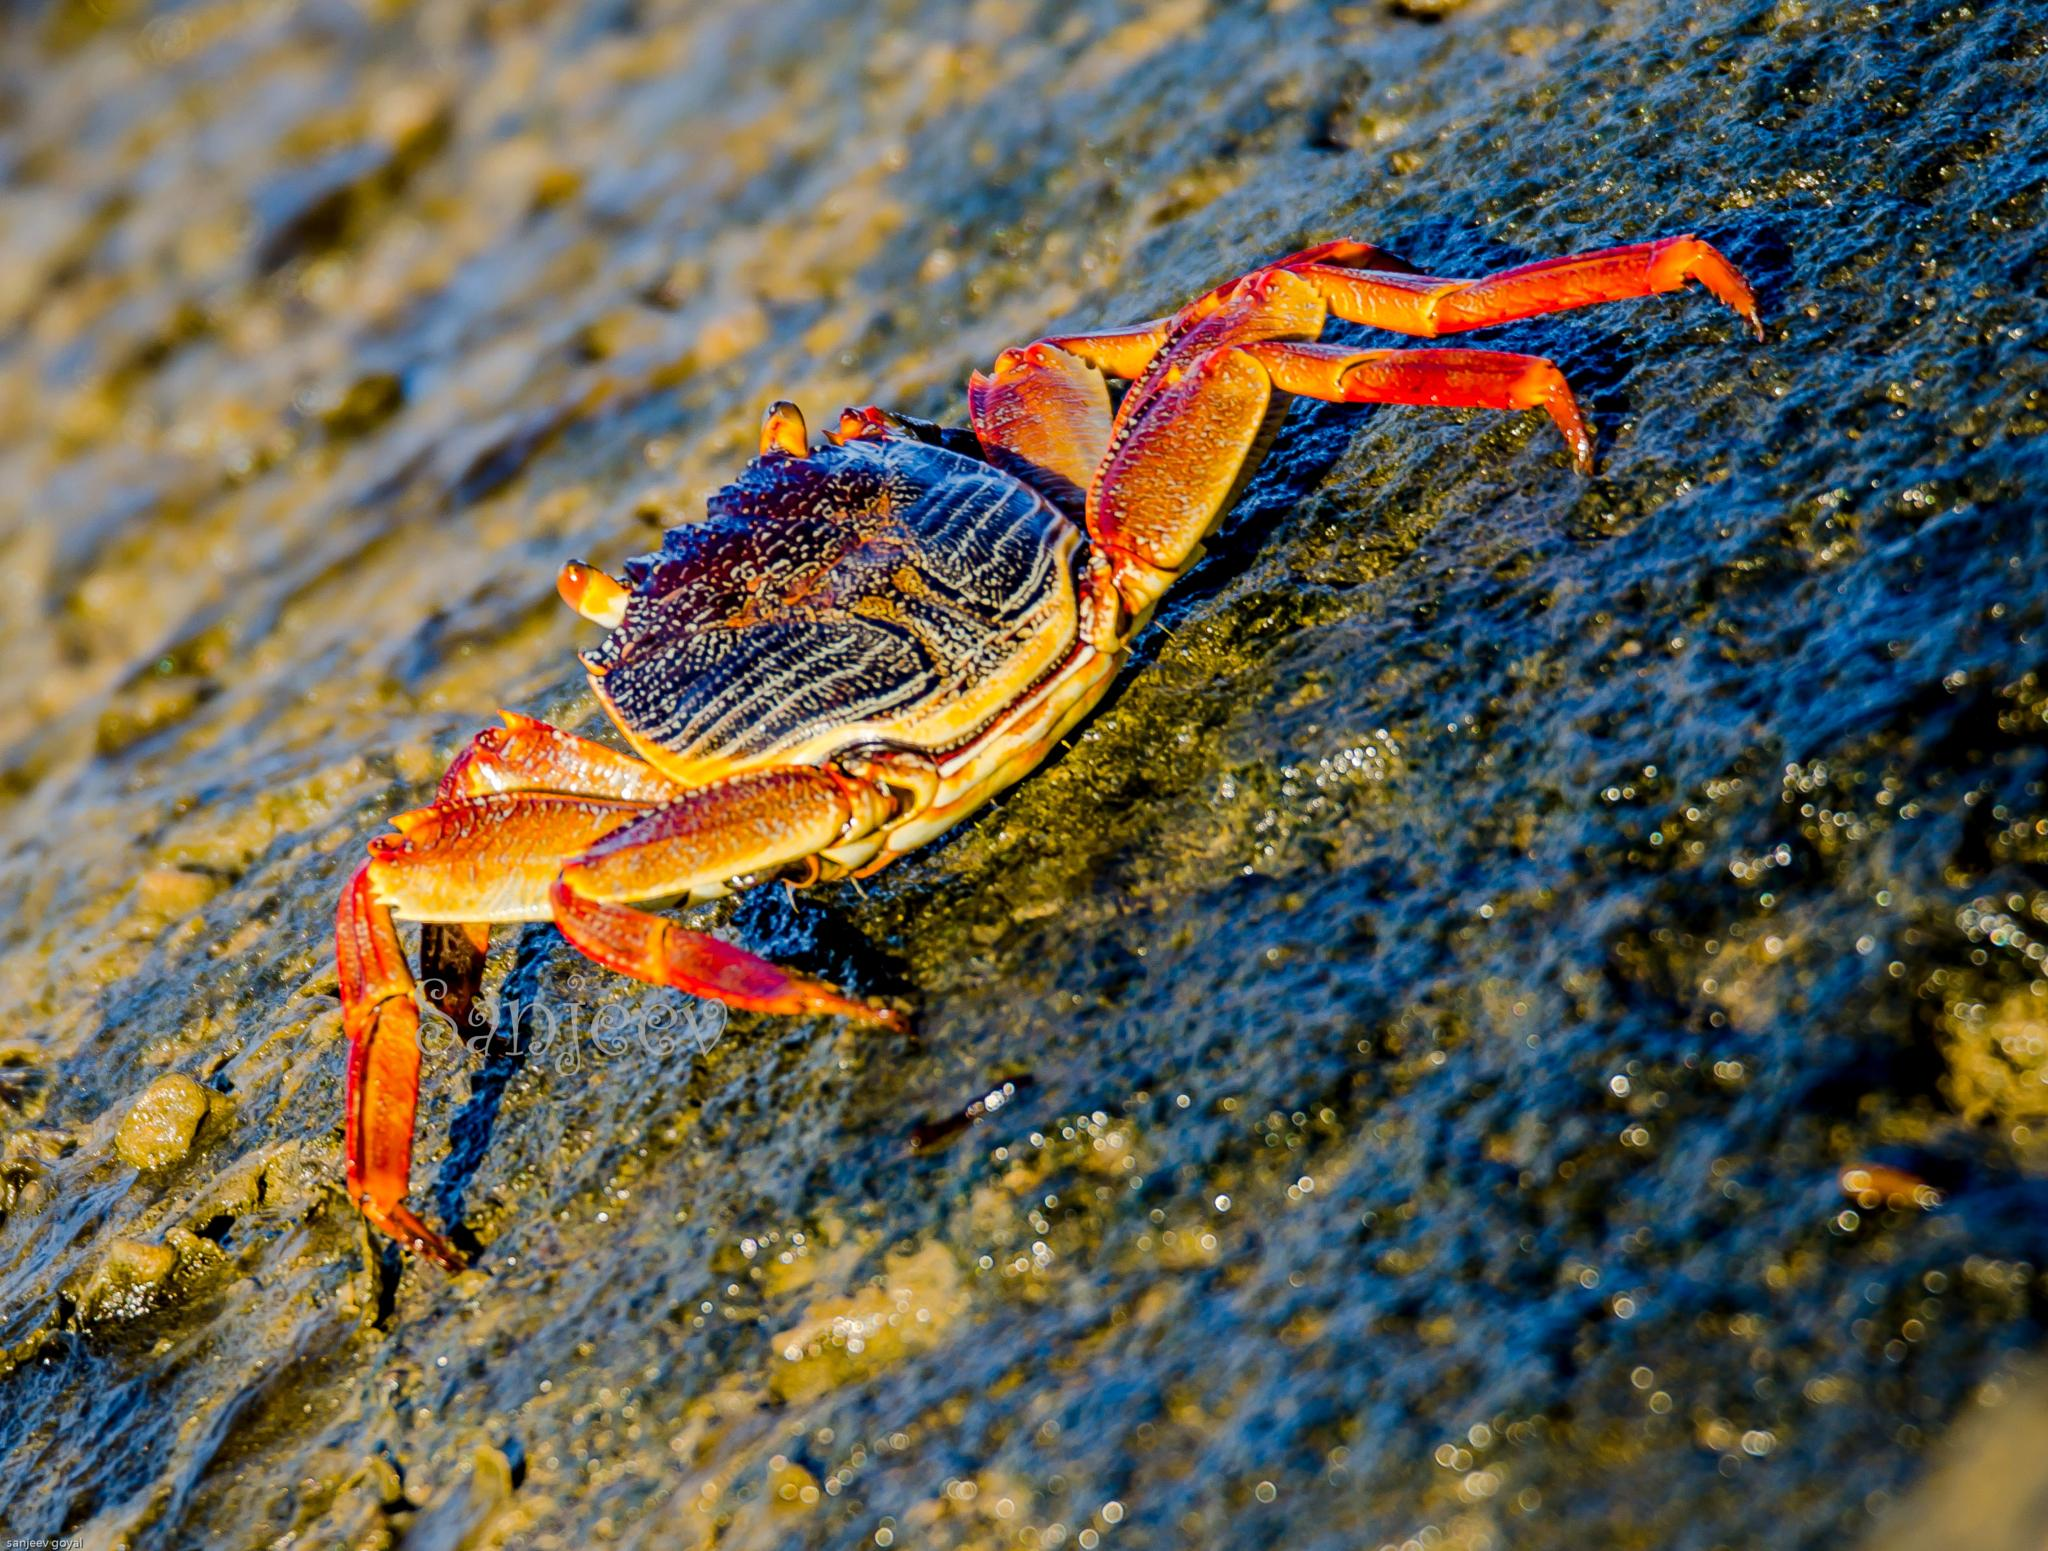 Crab by sanjeev.k.goyal.10